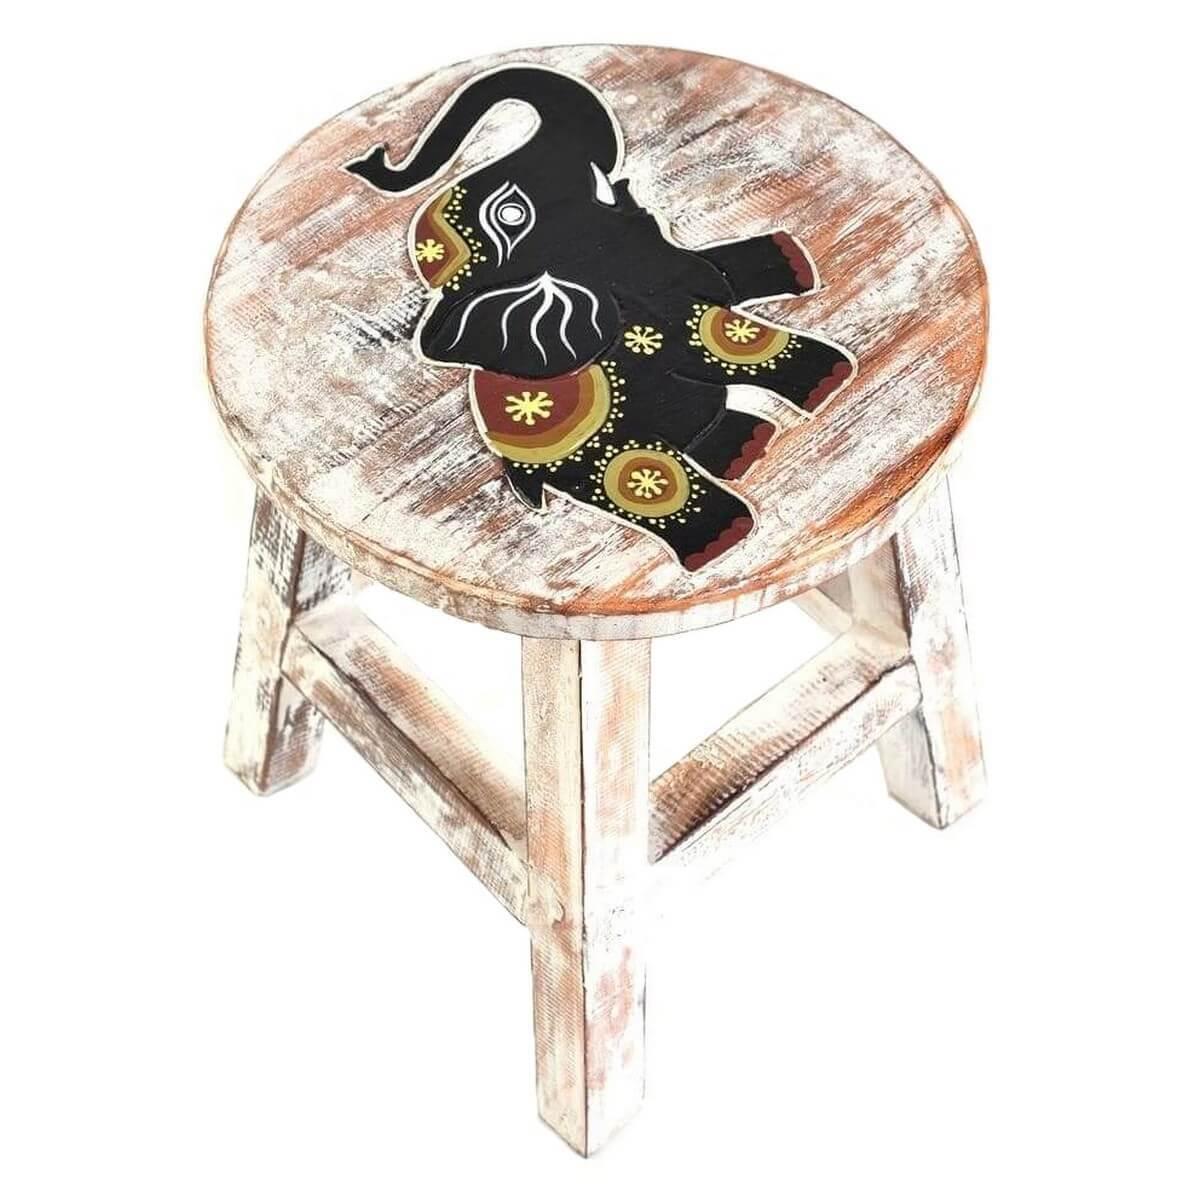 holzhocker kinderhocker hocker sitzhocker fu bank holz stuhl wei. Black Bedroom Furniture Sets. Home Design Ideas